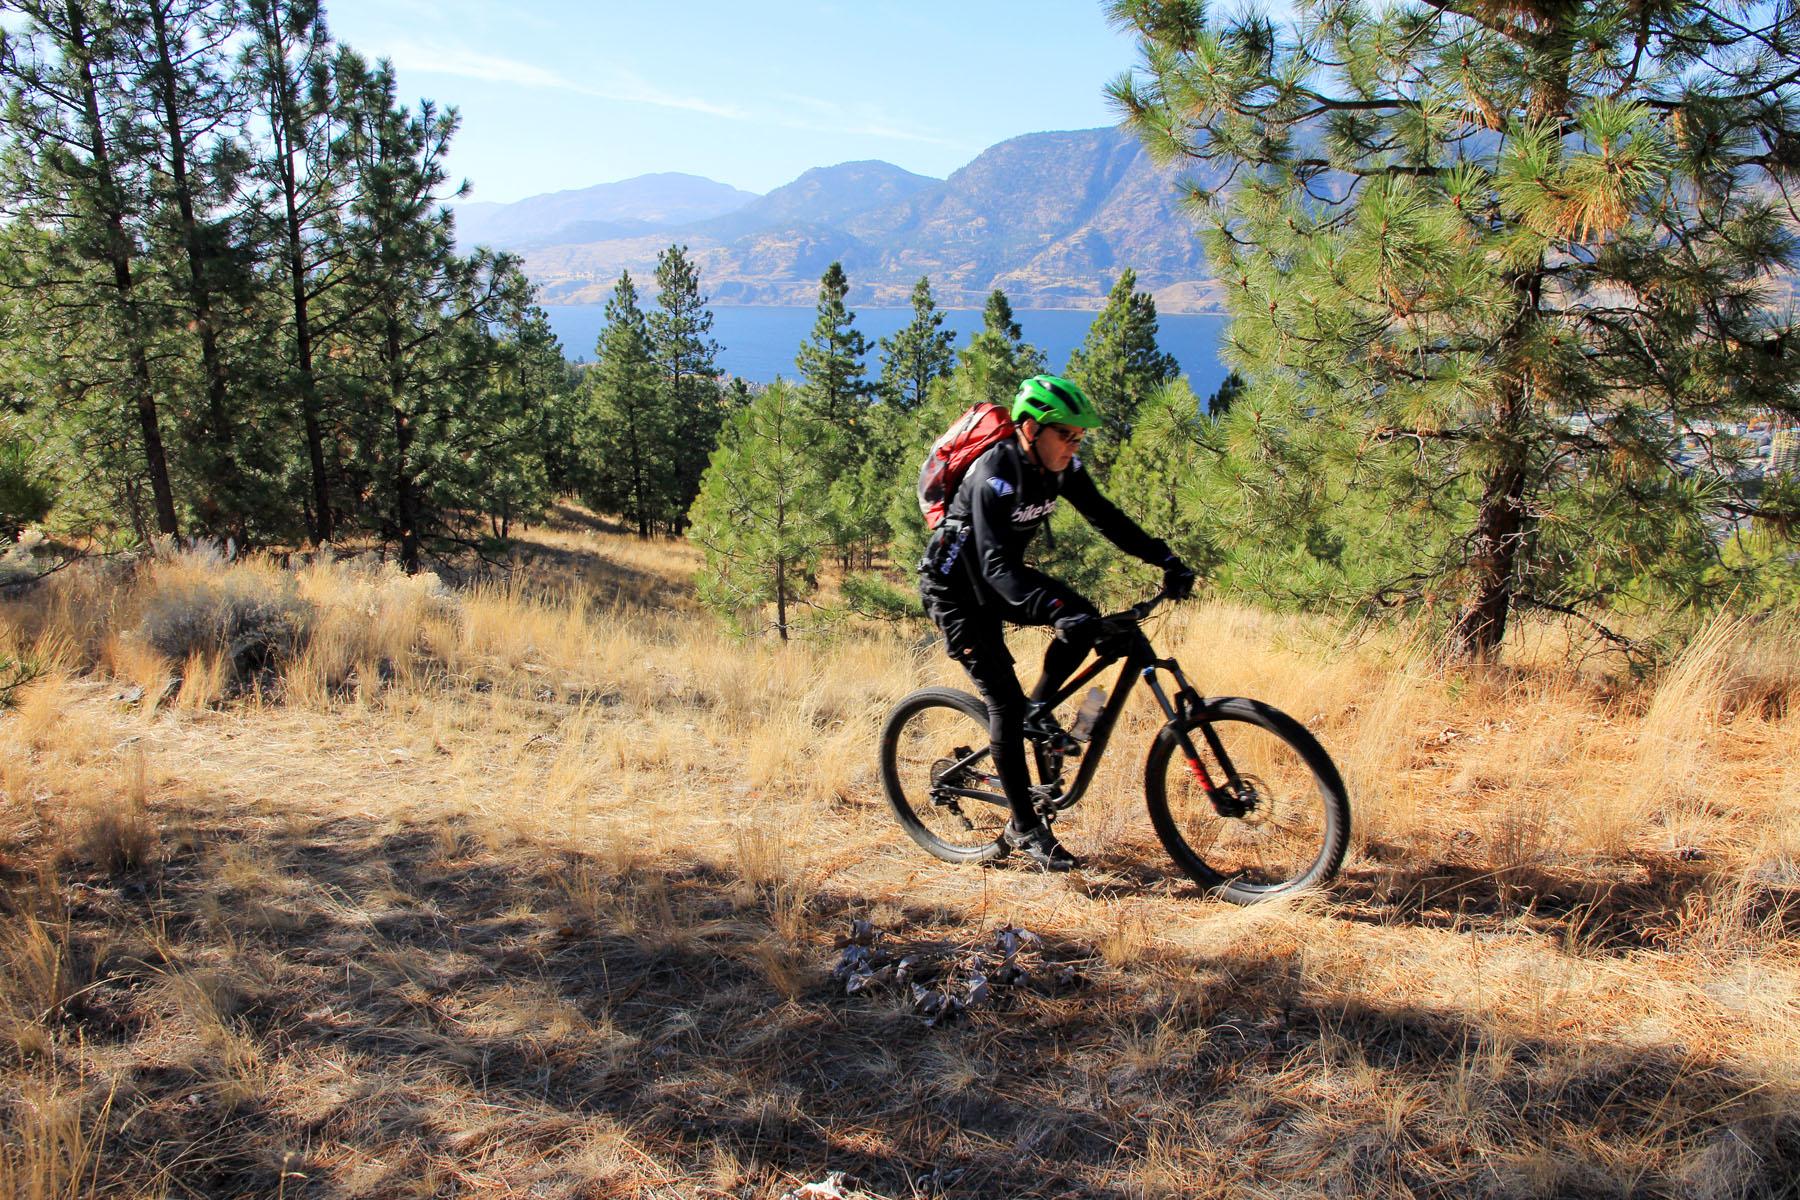 Biking at the Bluffs at Skaha